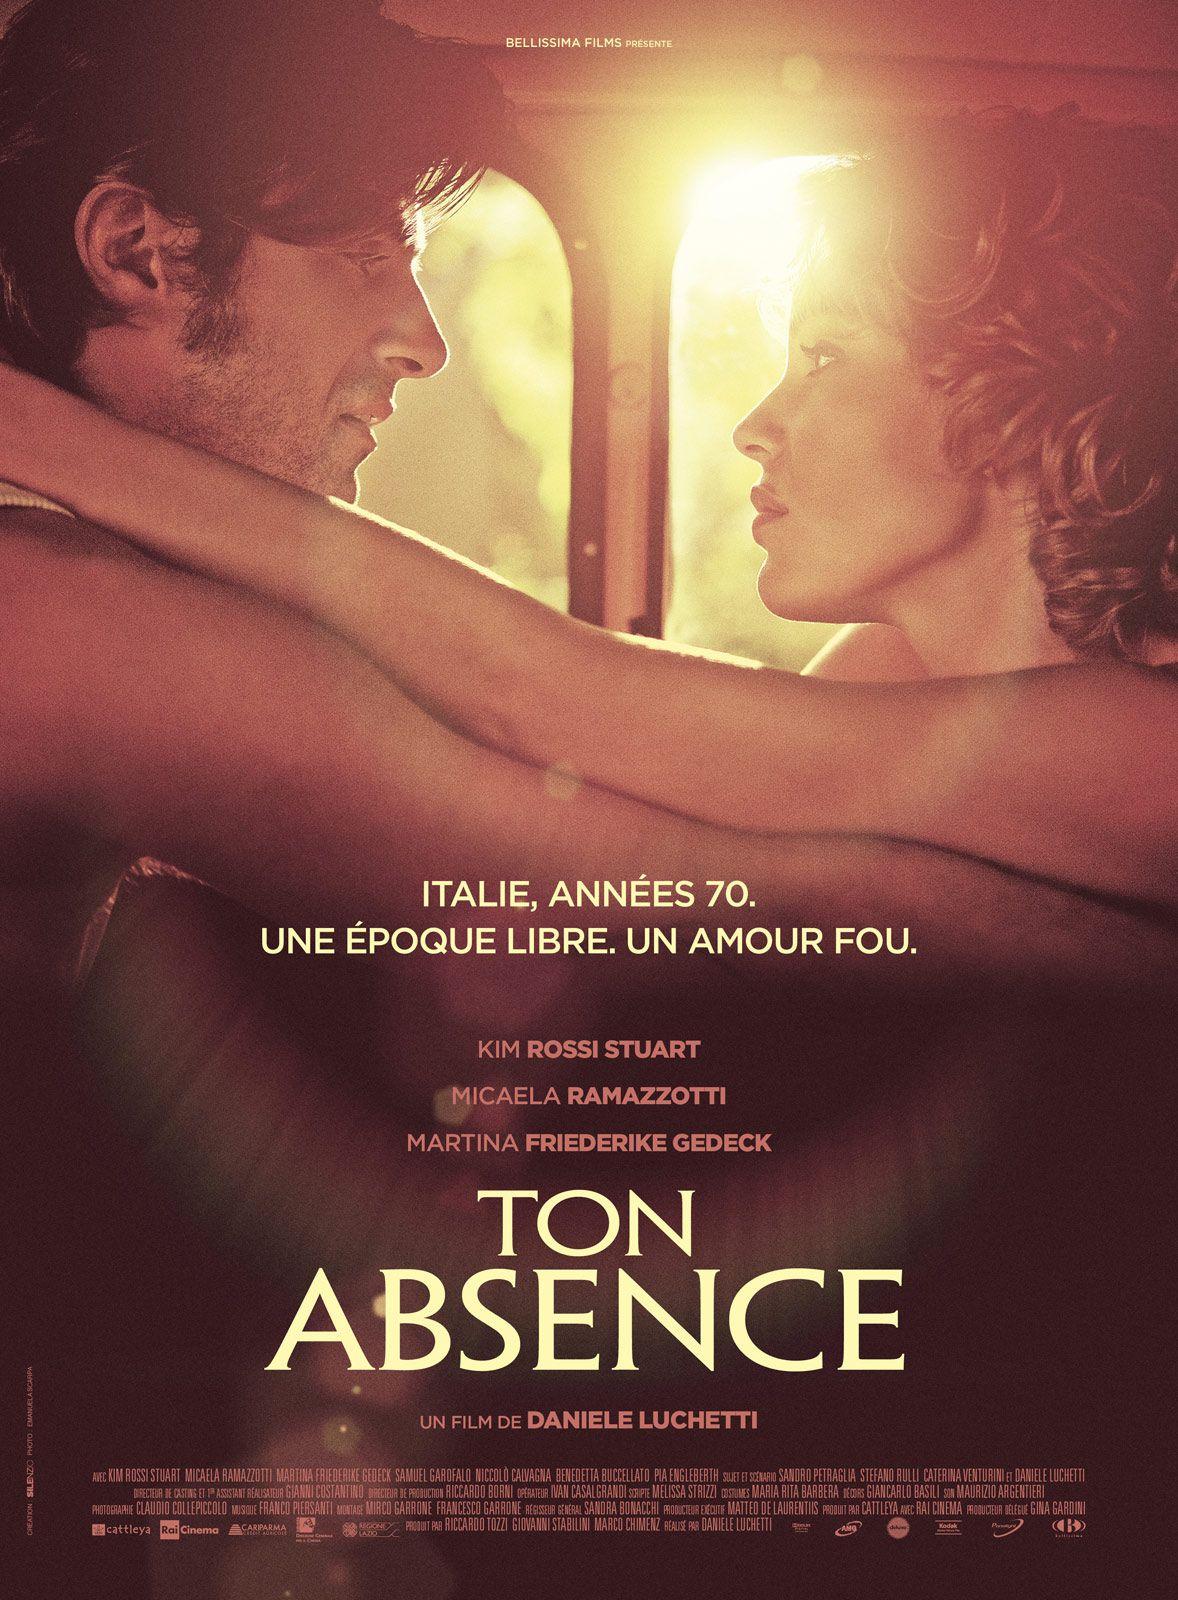 Ton absence - Film (2014)